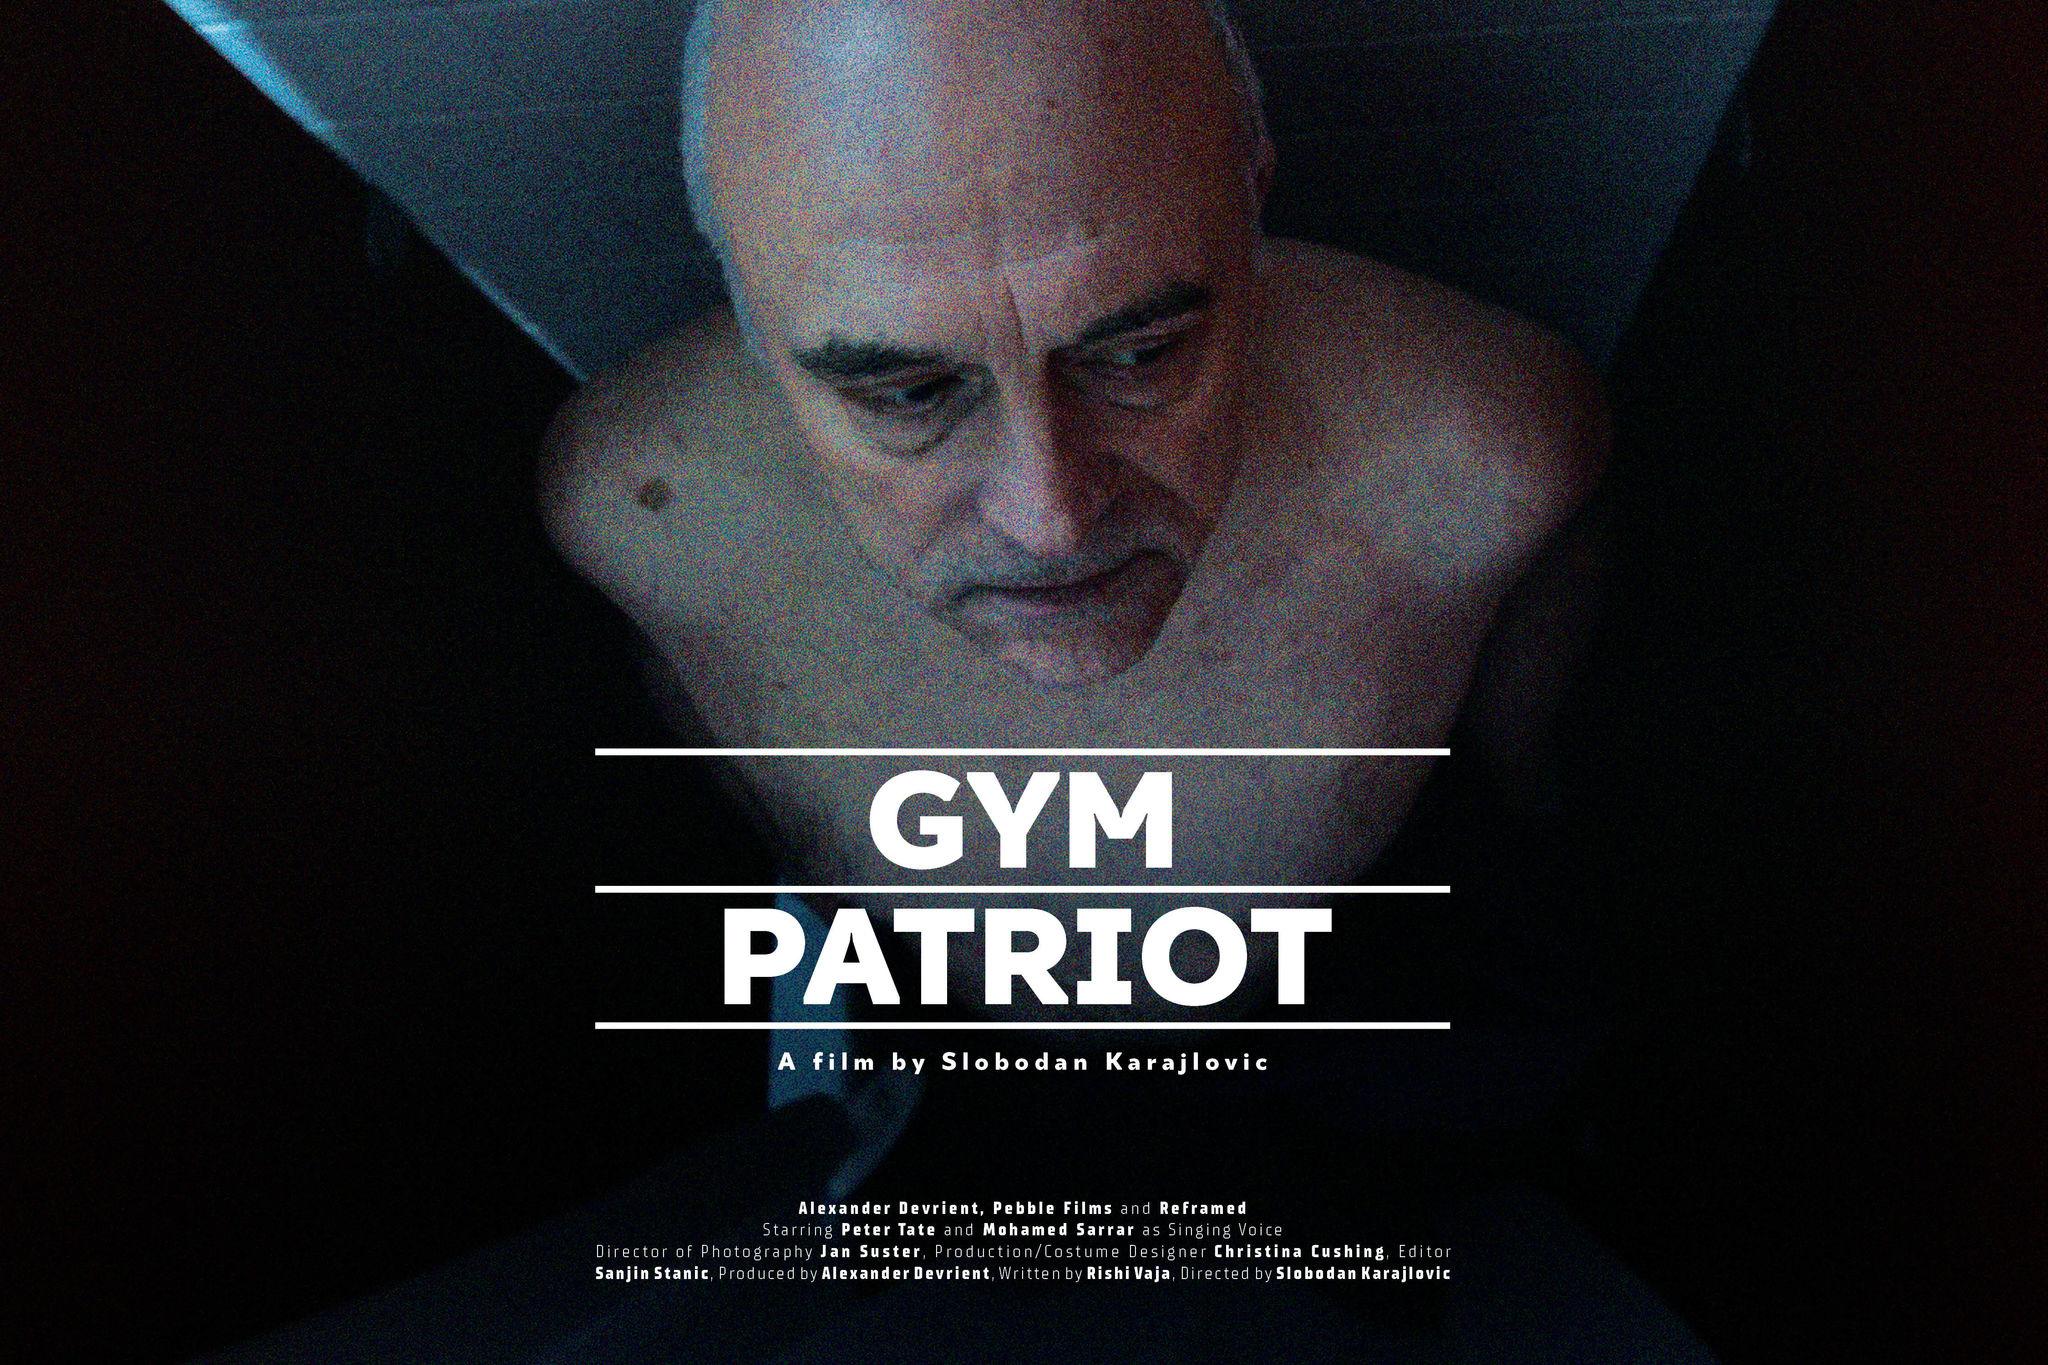 Gym Patriot